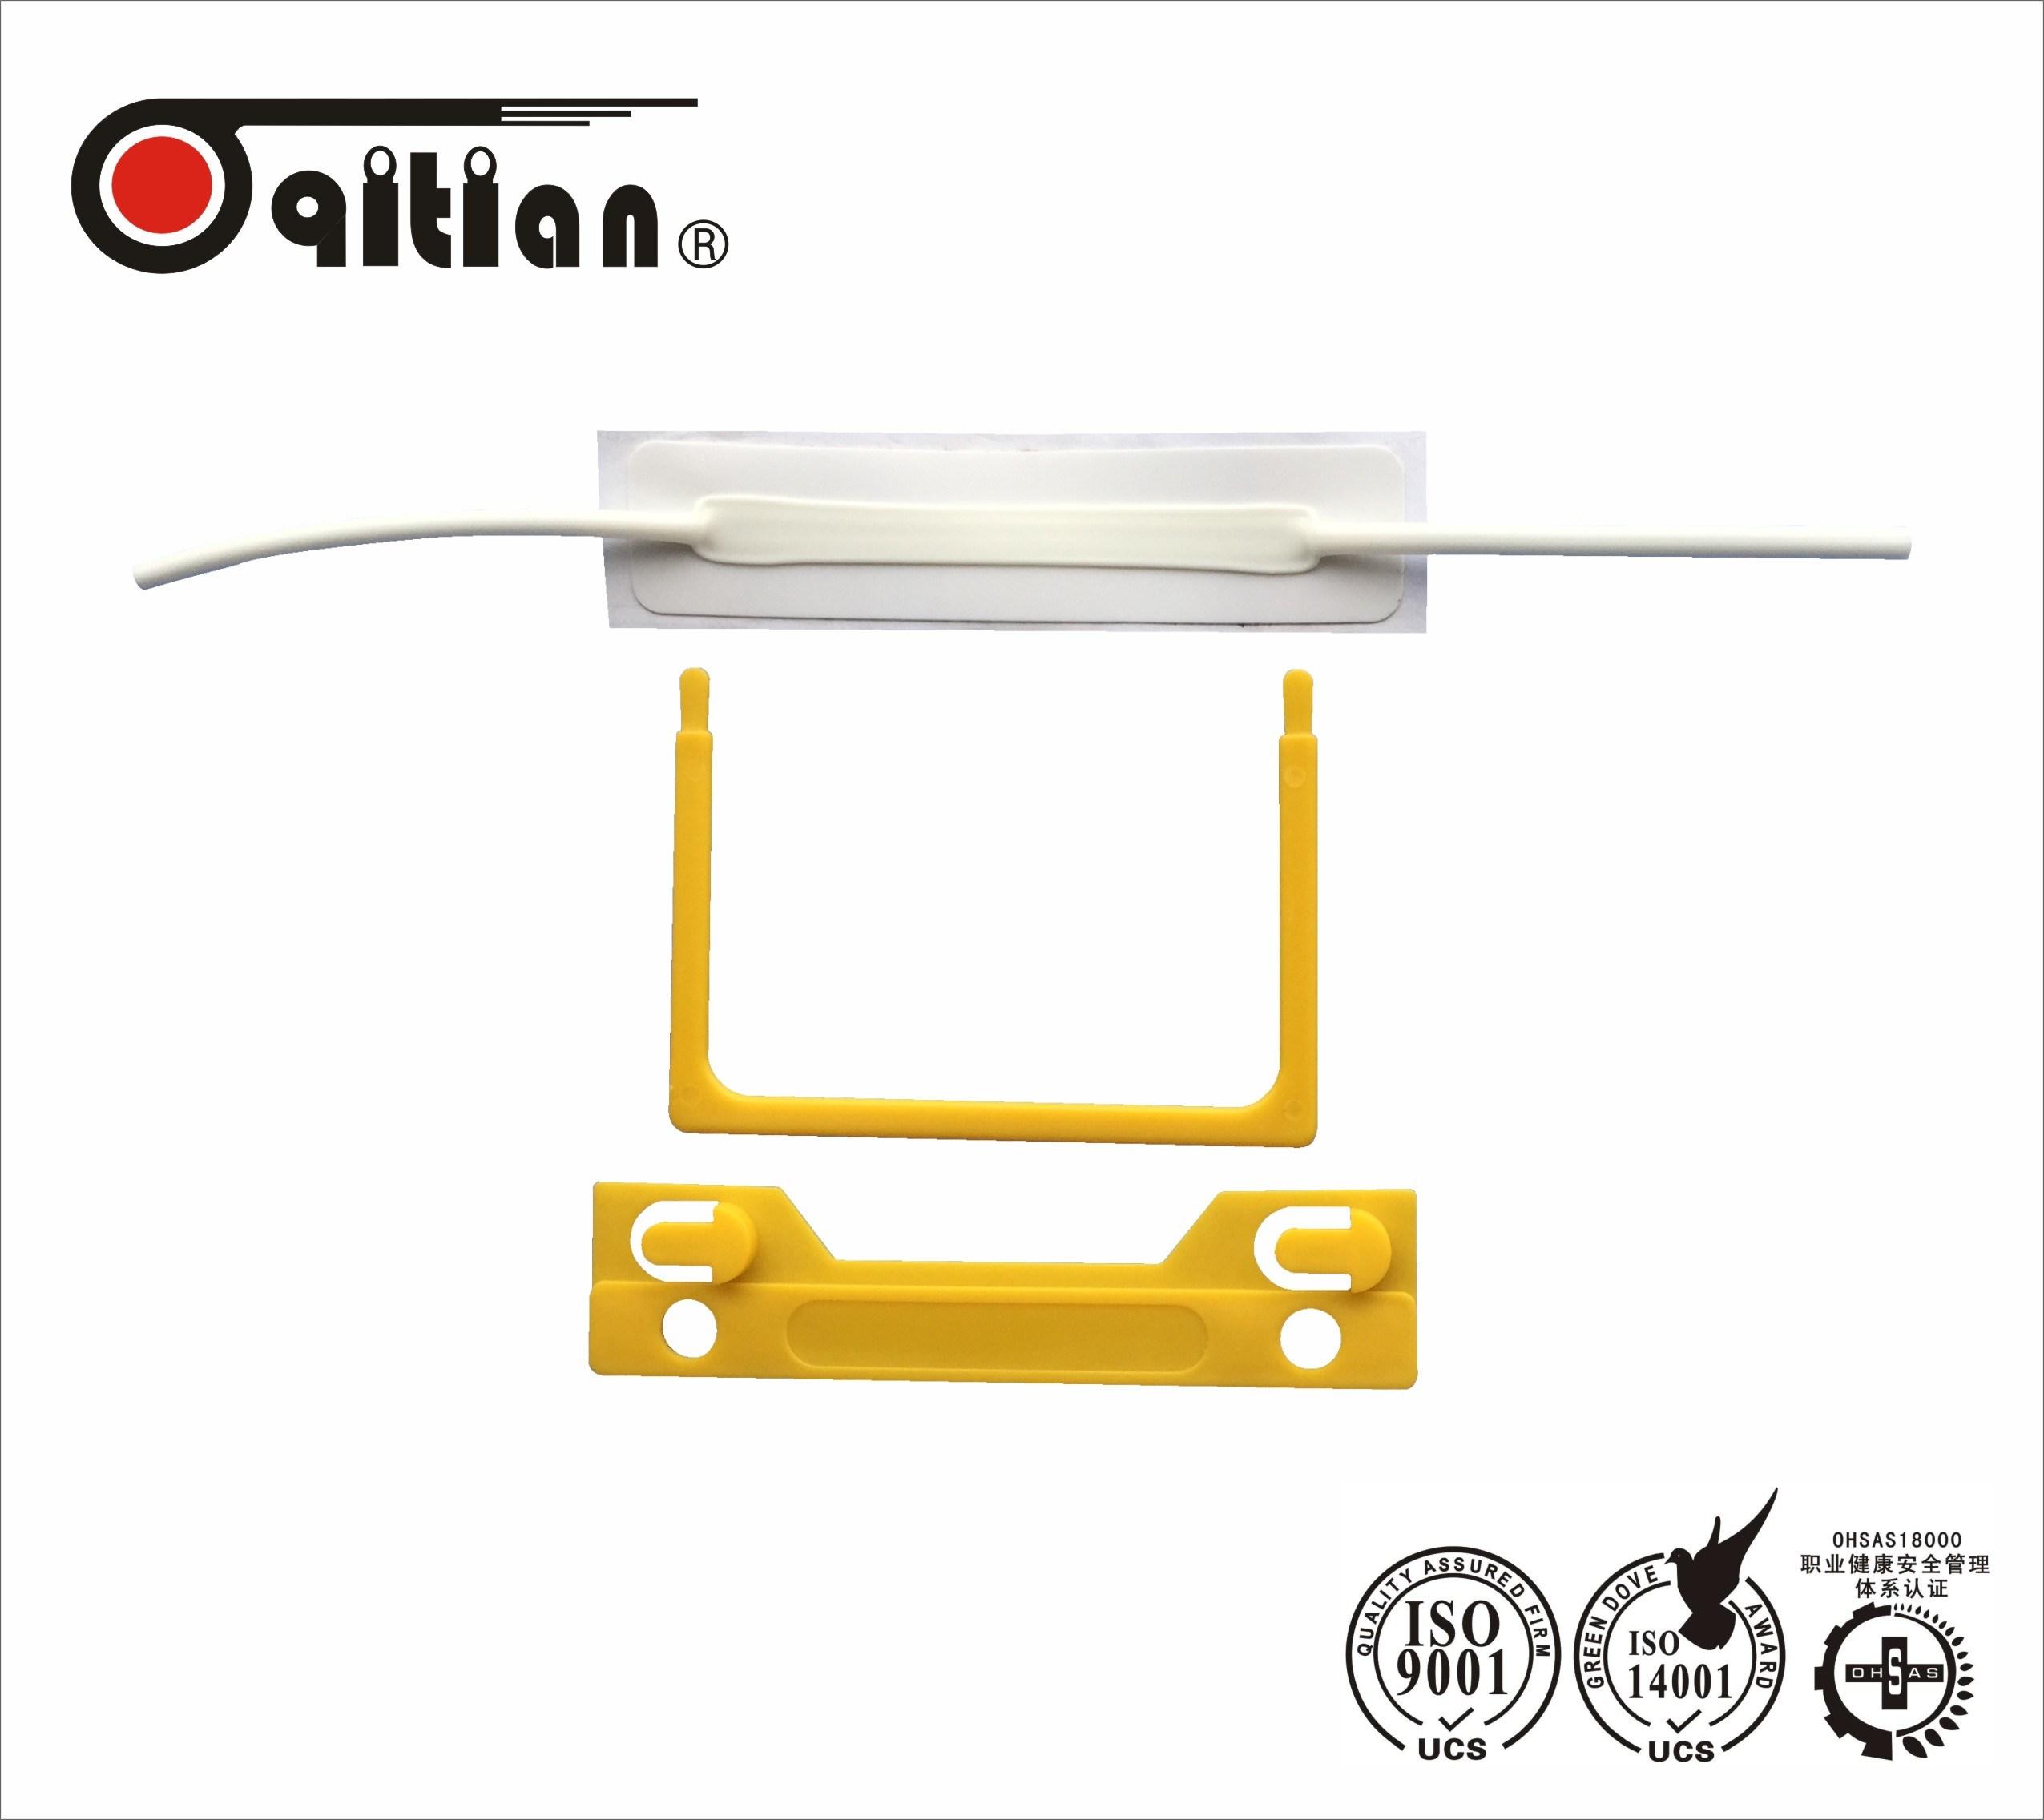 China Adhesive Plastic U Clip Paper Fastener Stationery